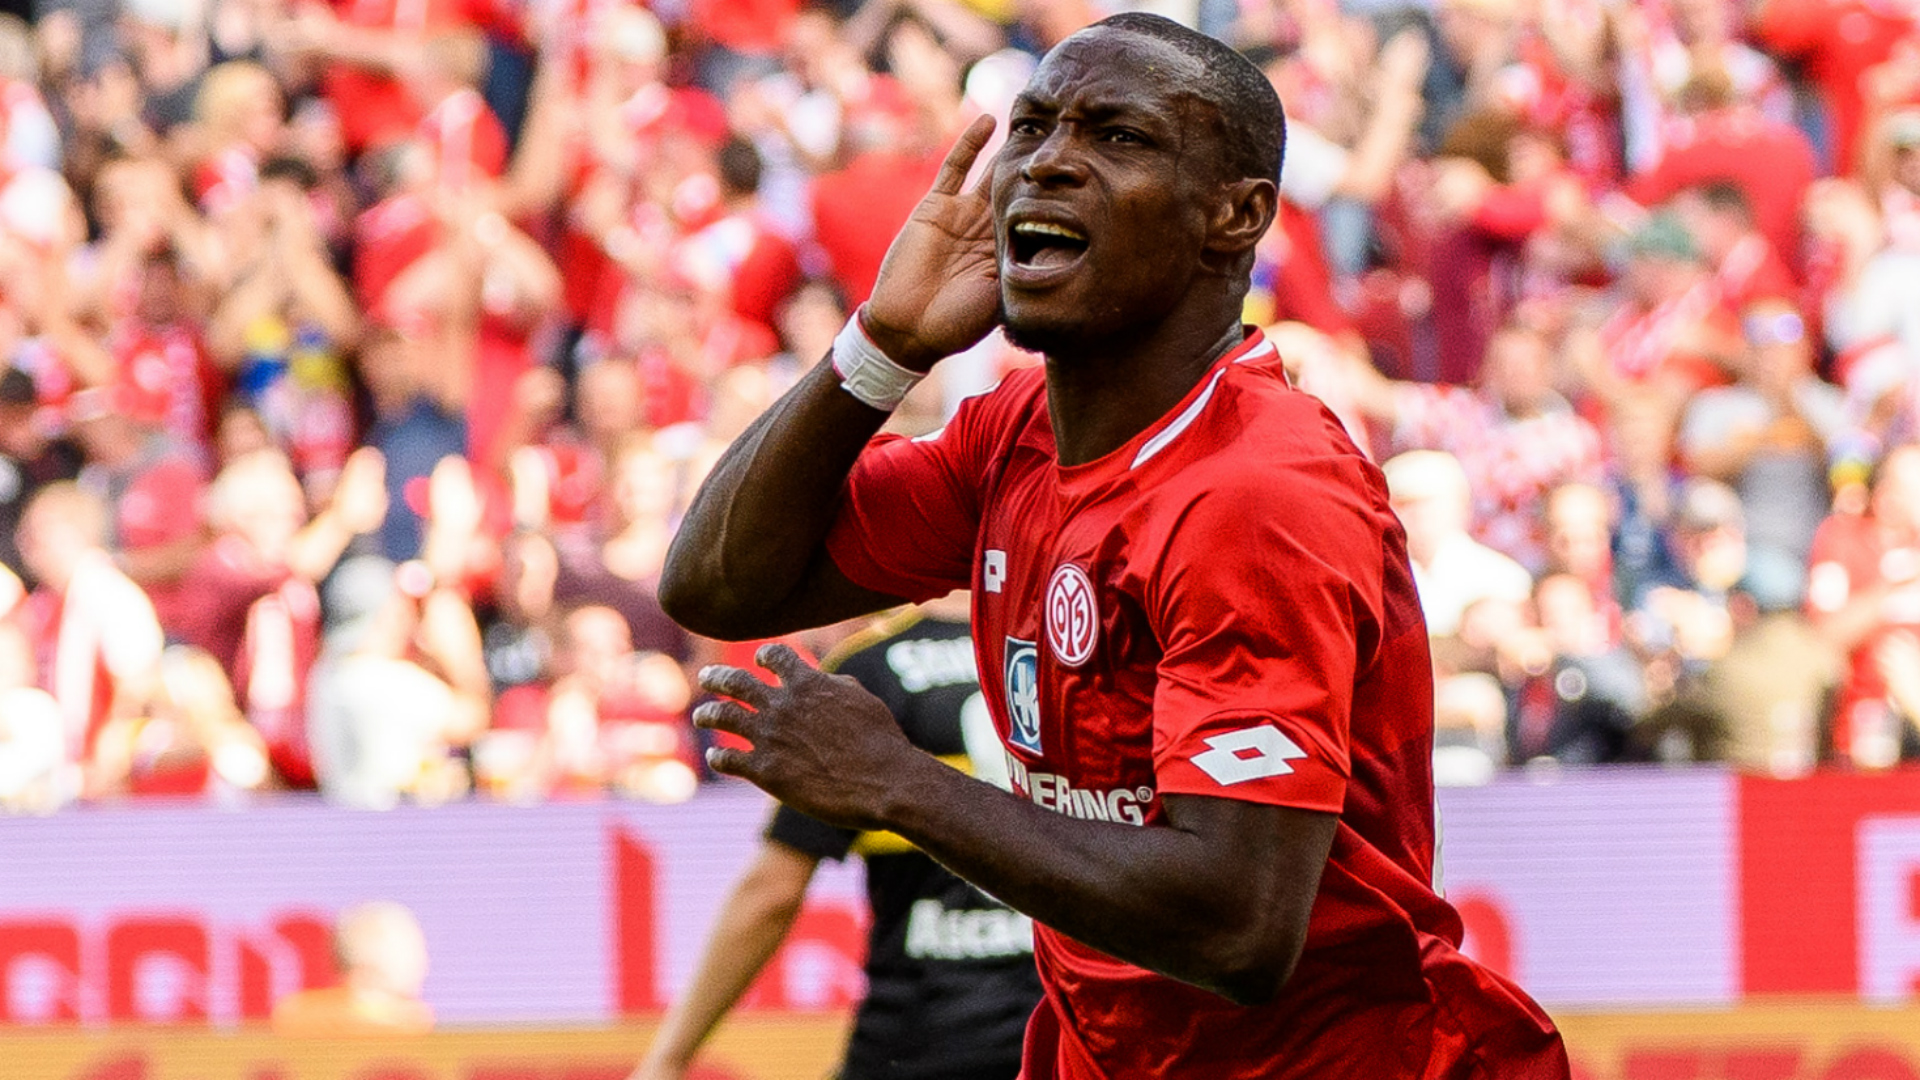 Anthony Ujah leads Mainz 05 to victory over Eintracht Frankfurt